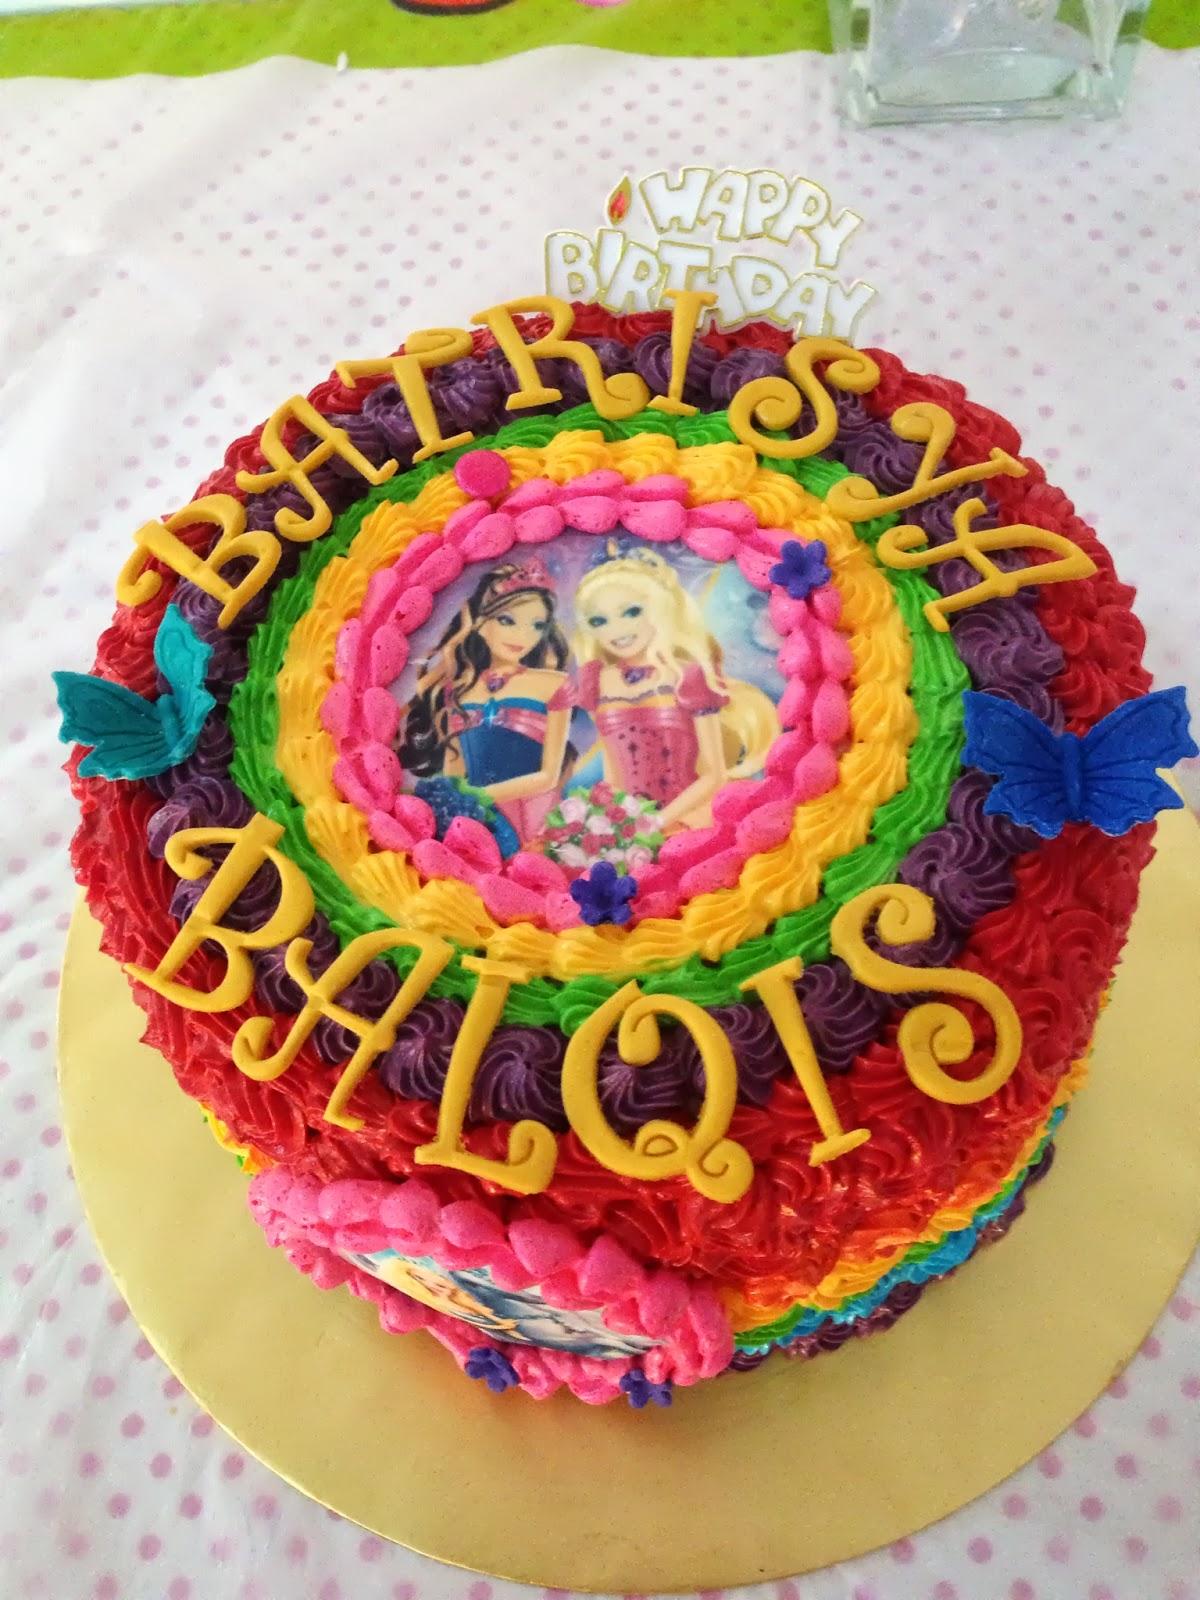 Vintage Rainbow Cake Decoration Edible : ninie cakes house: Rainbow cake with edible barbie